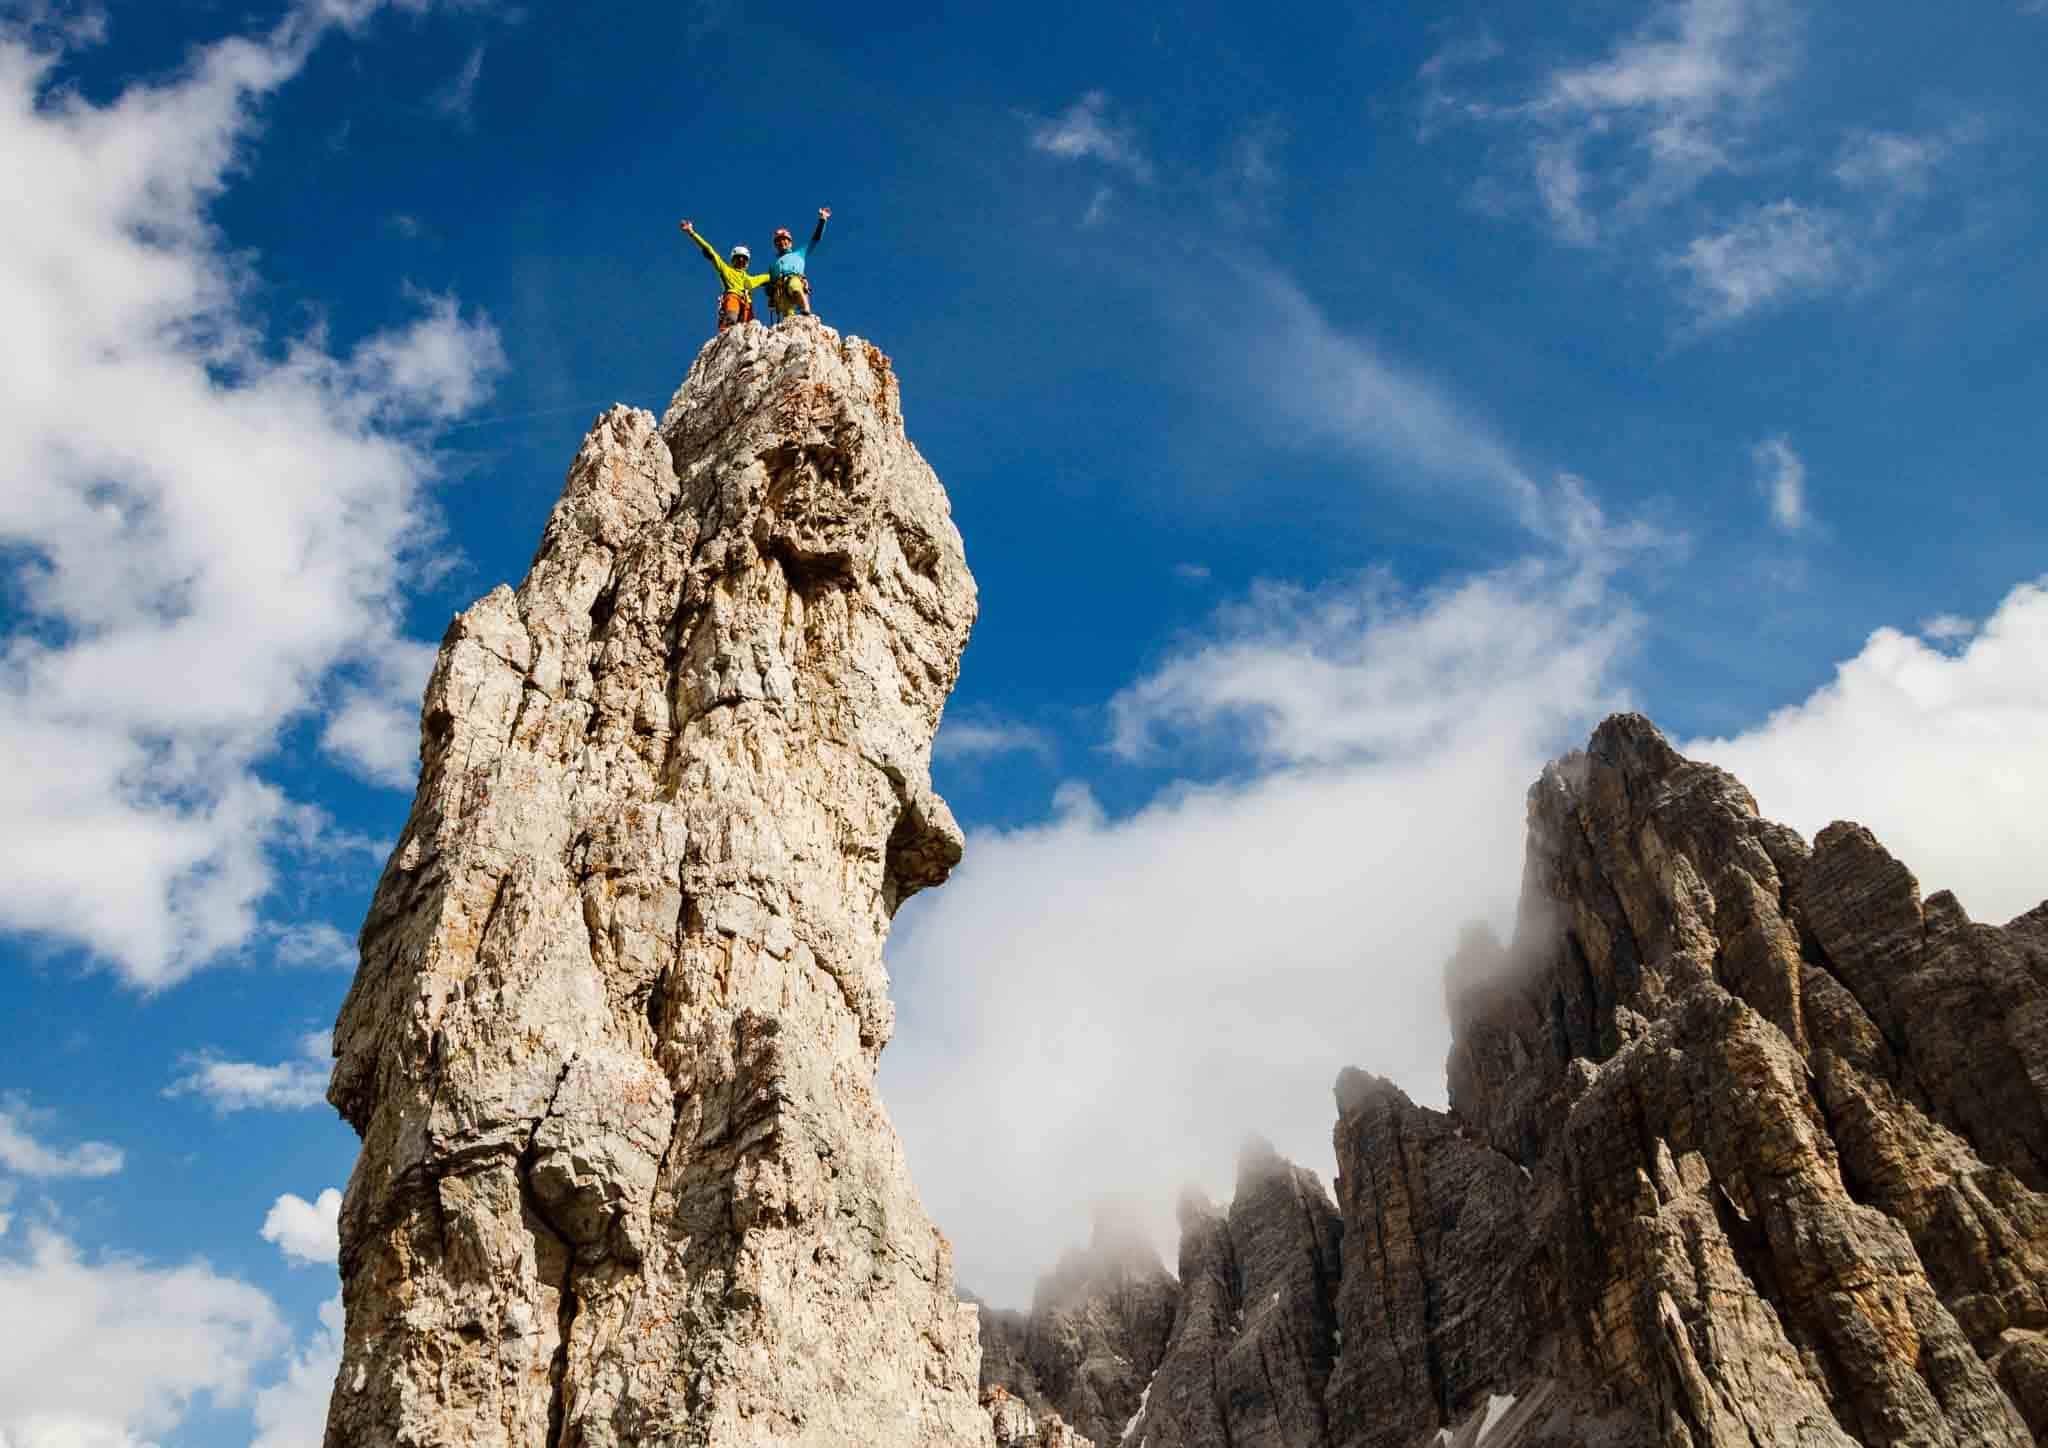 Turm Klettern